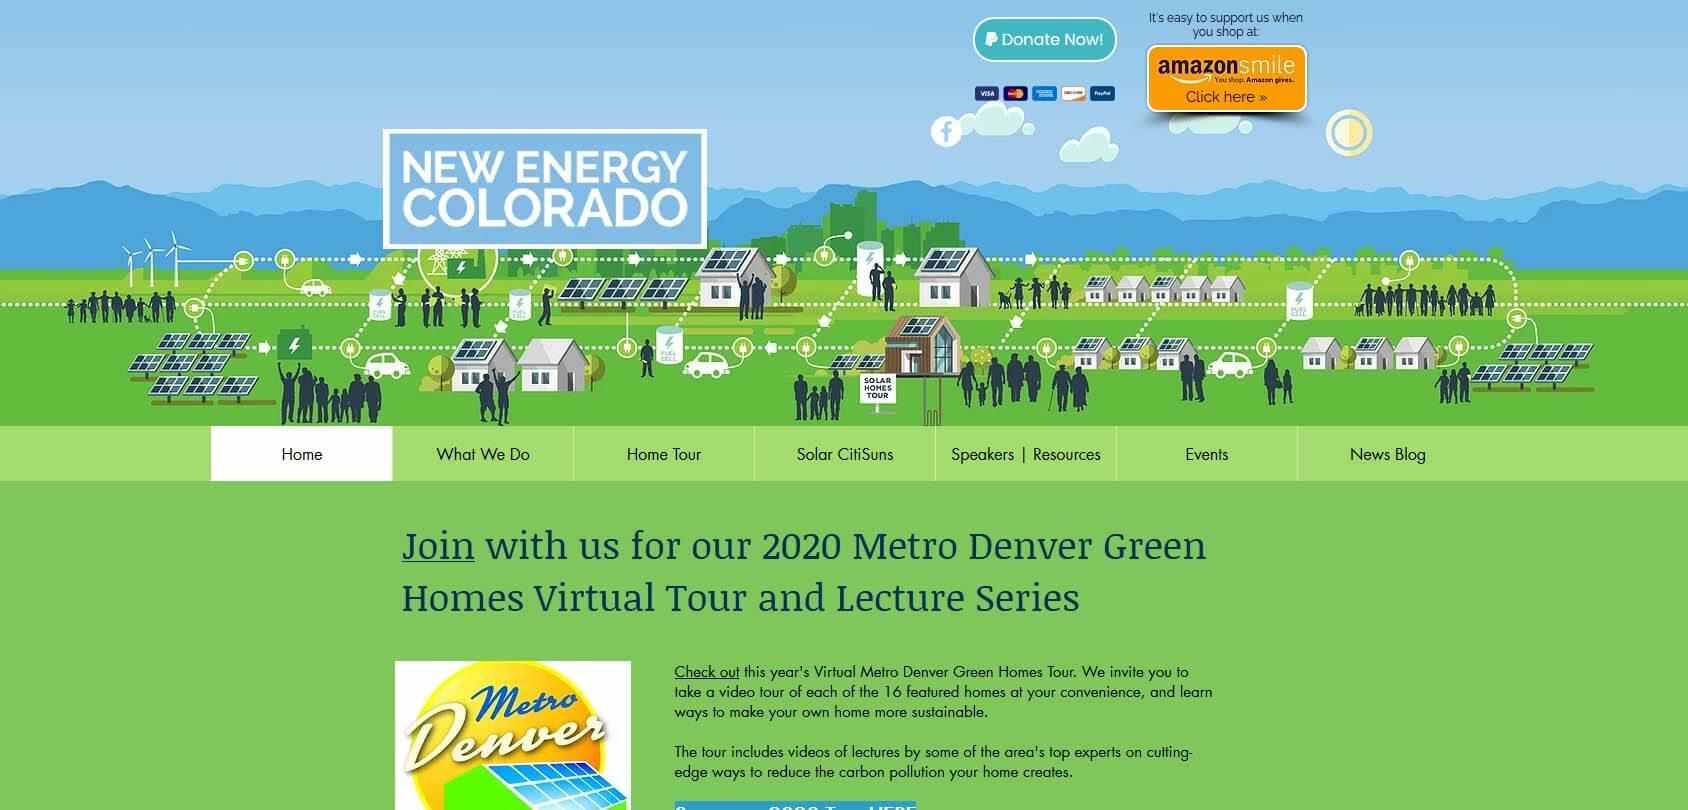 New Energy Colorado Homepage